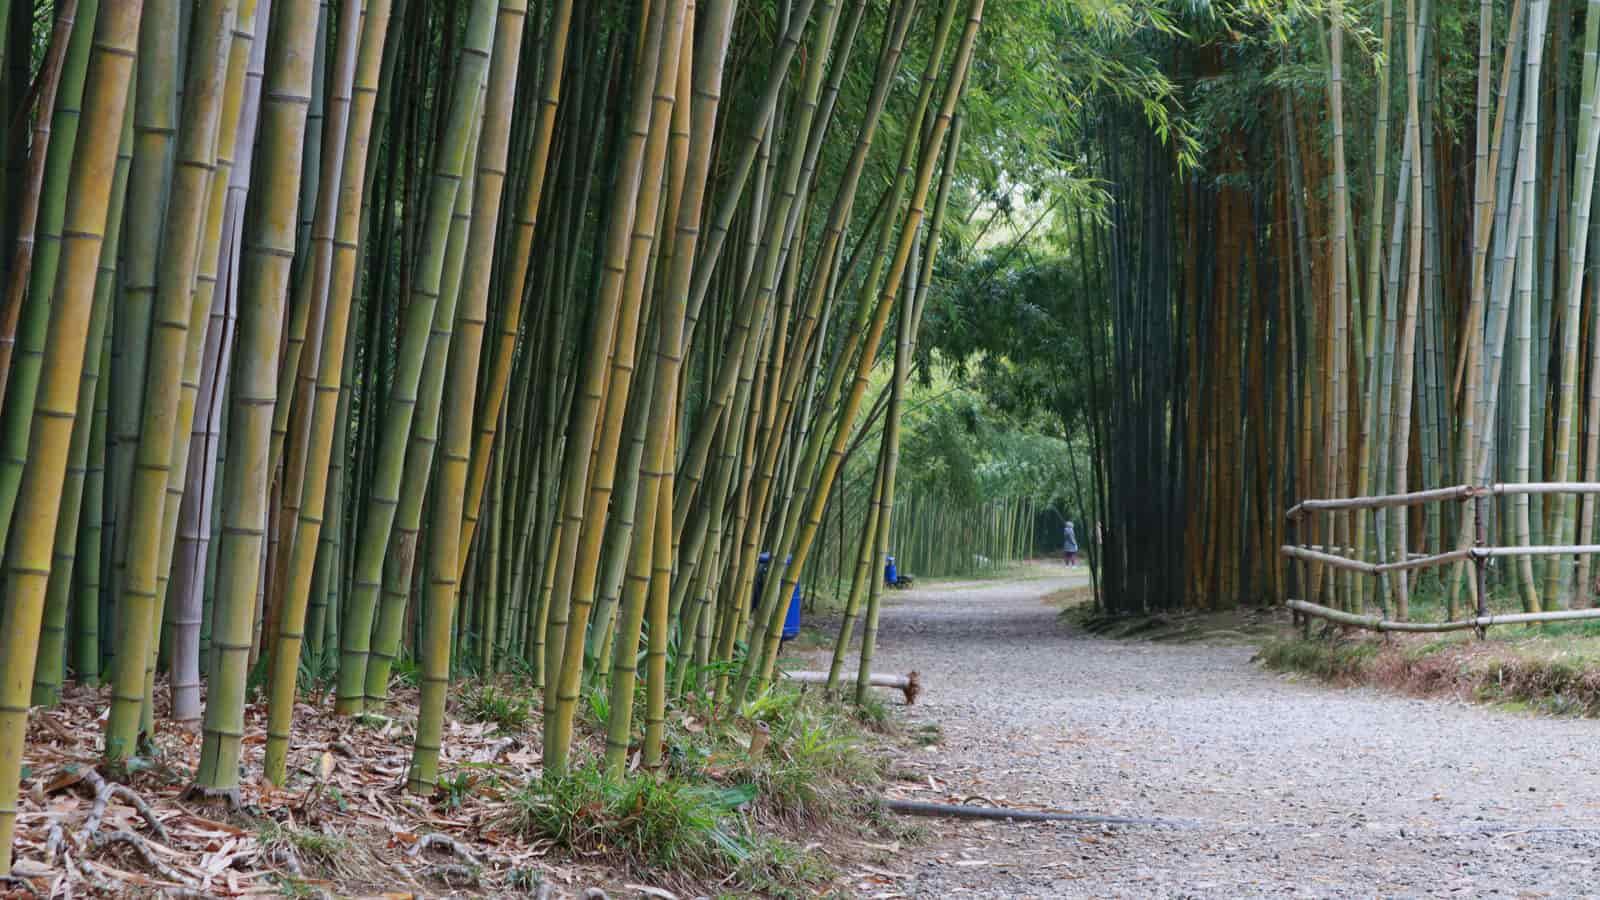 abhaziya-bambuk-botanicheskiy-sad (1)